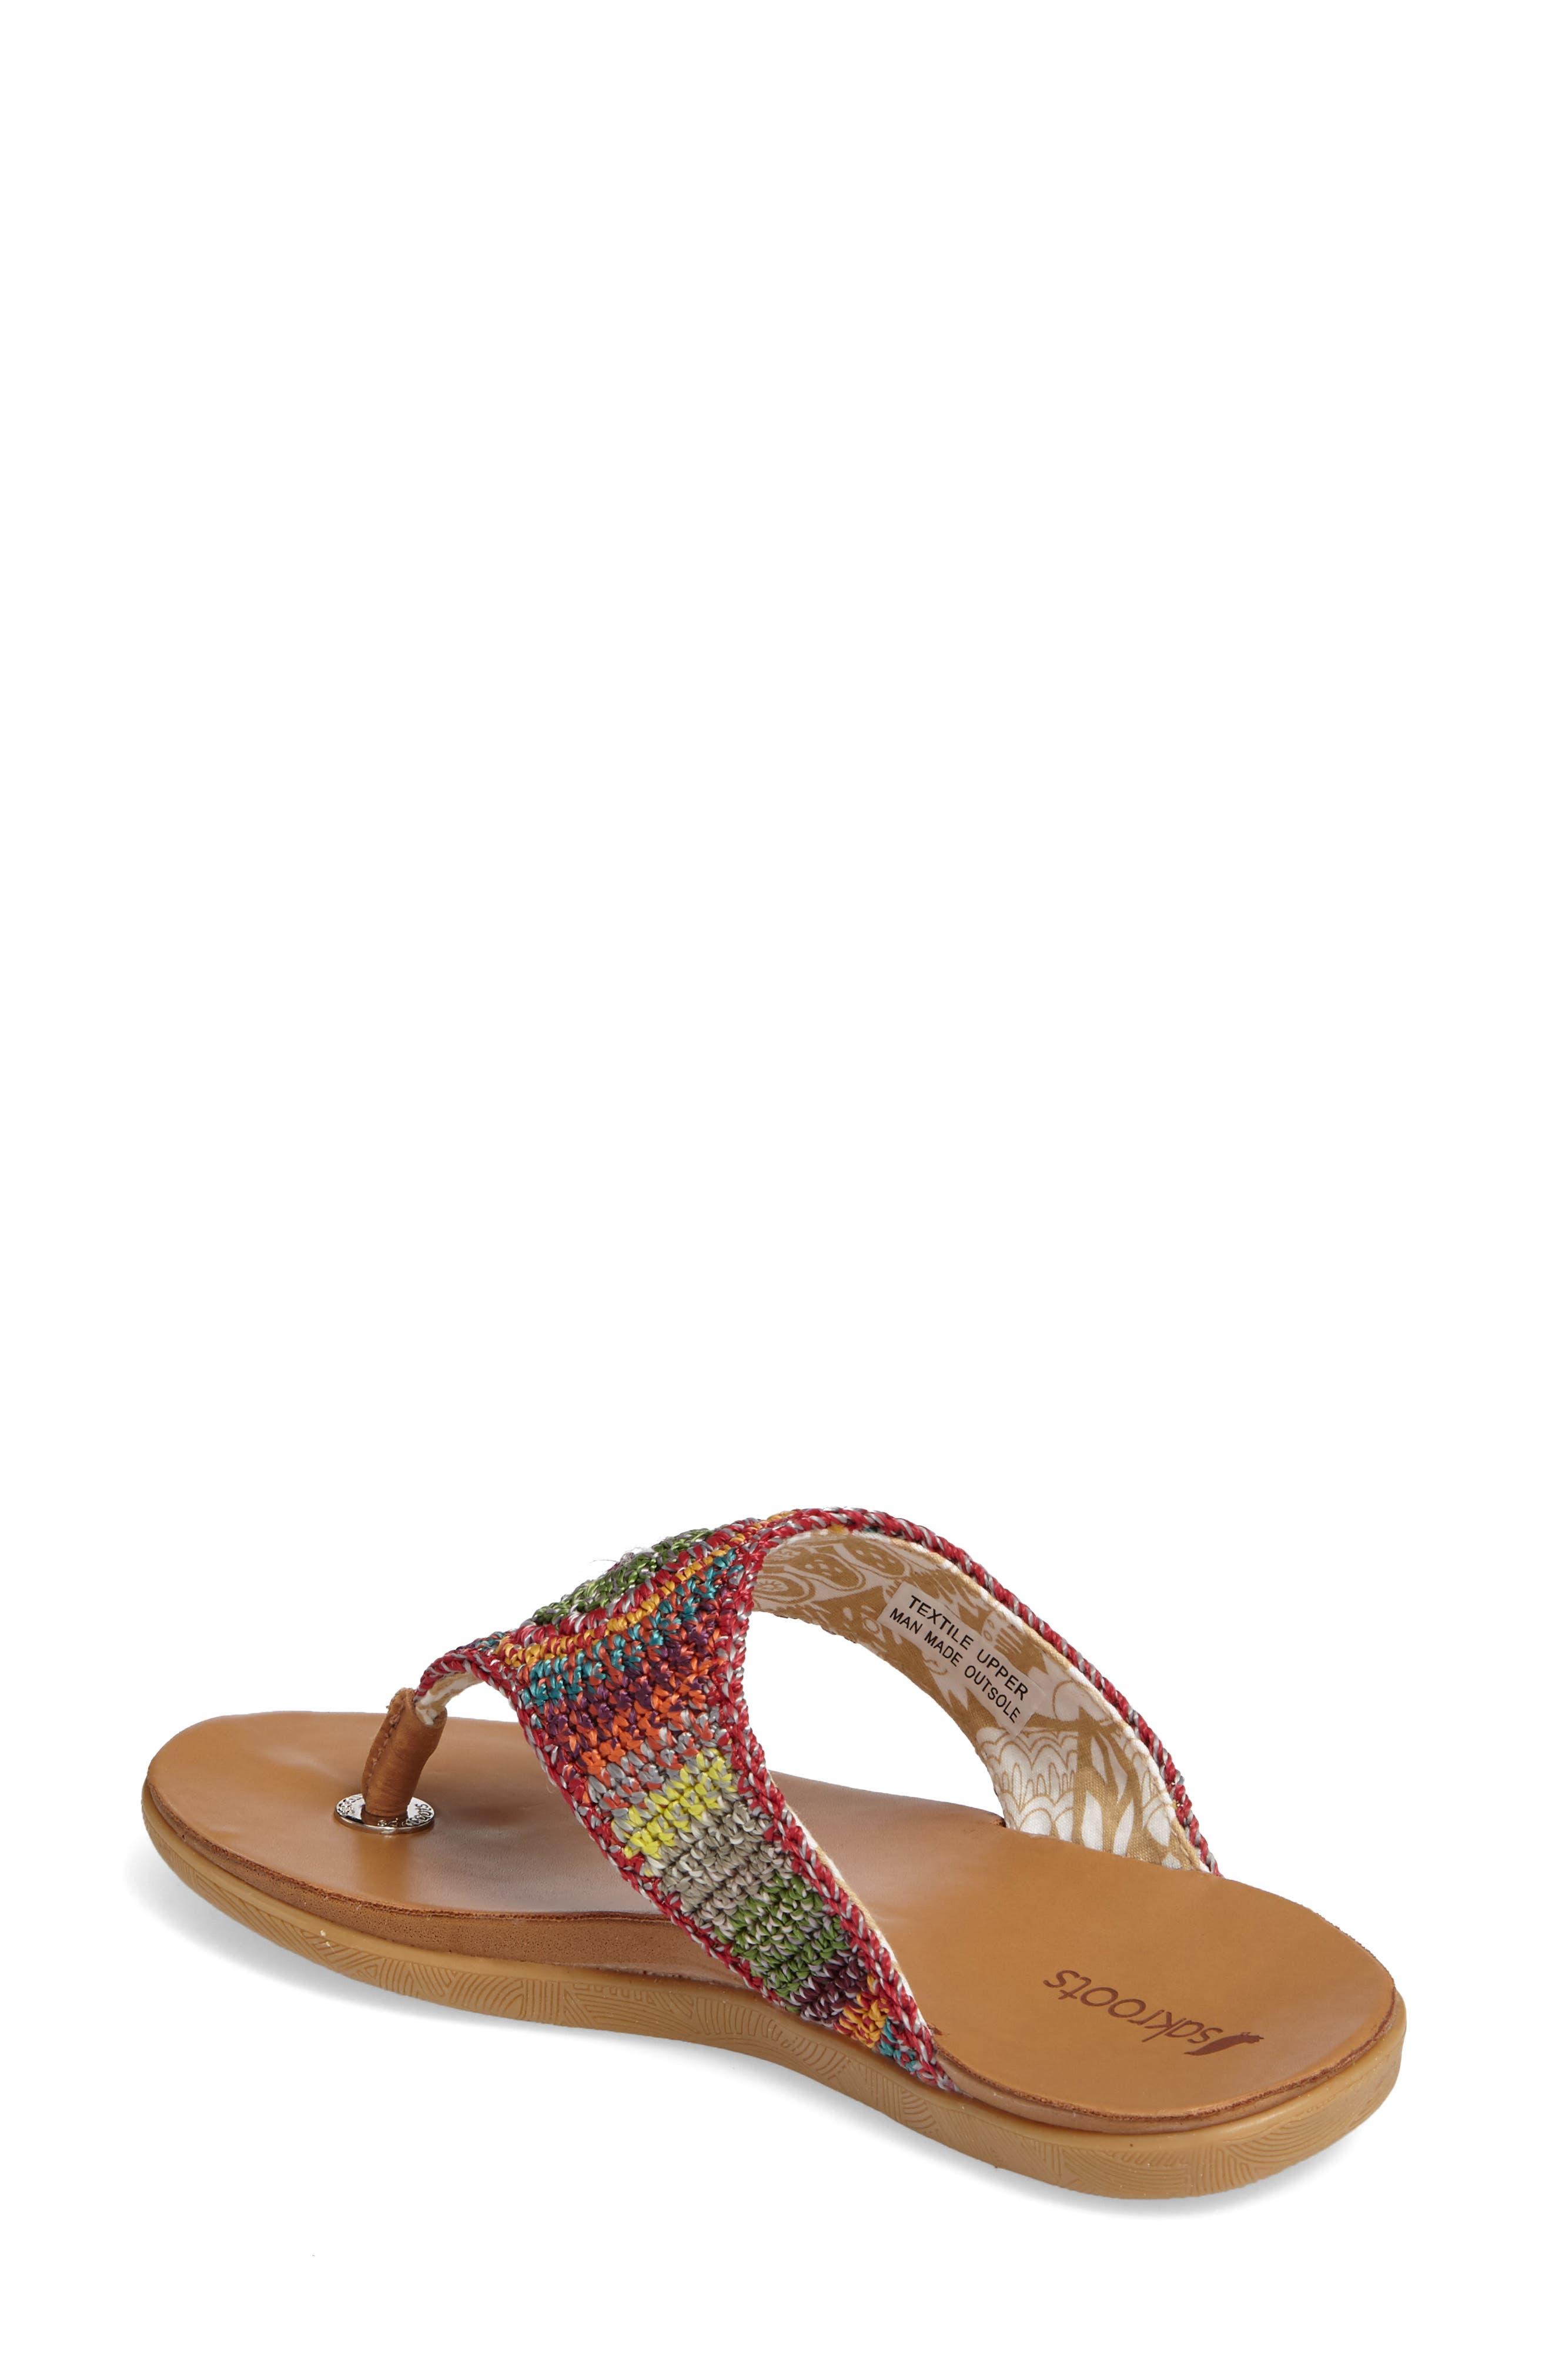 Alternate Image 2  - Sakroots Sarria Flip Flop (Women)